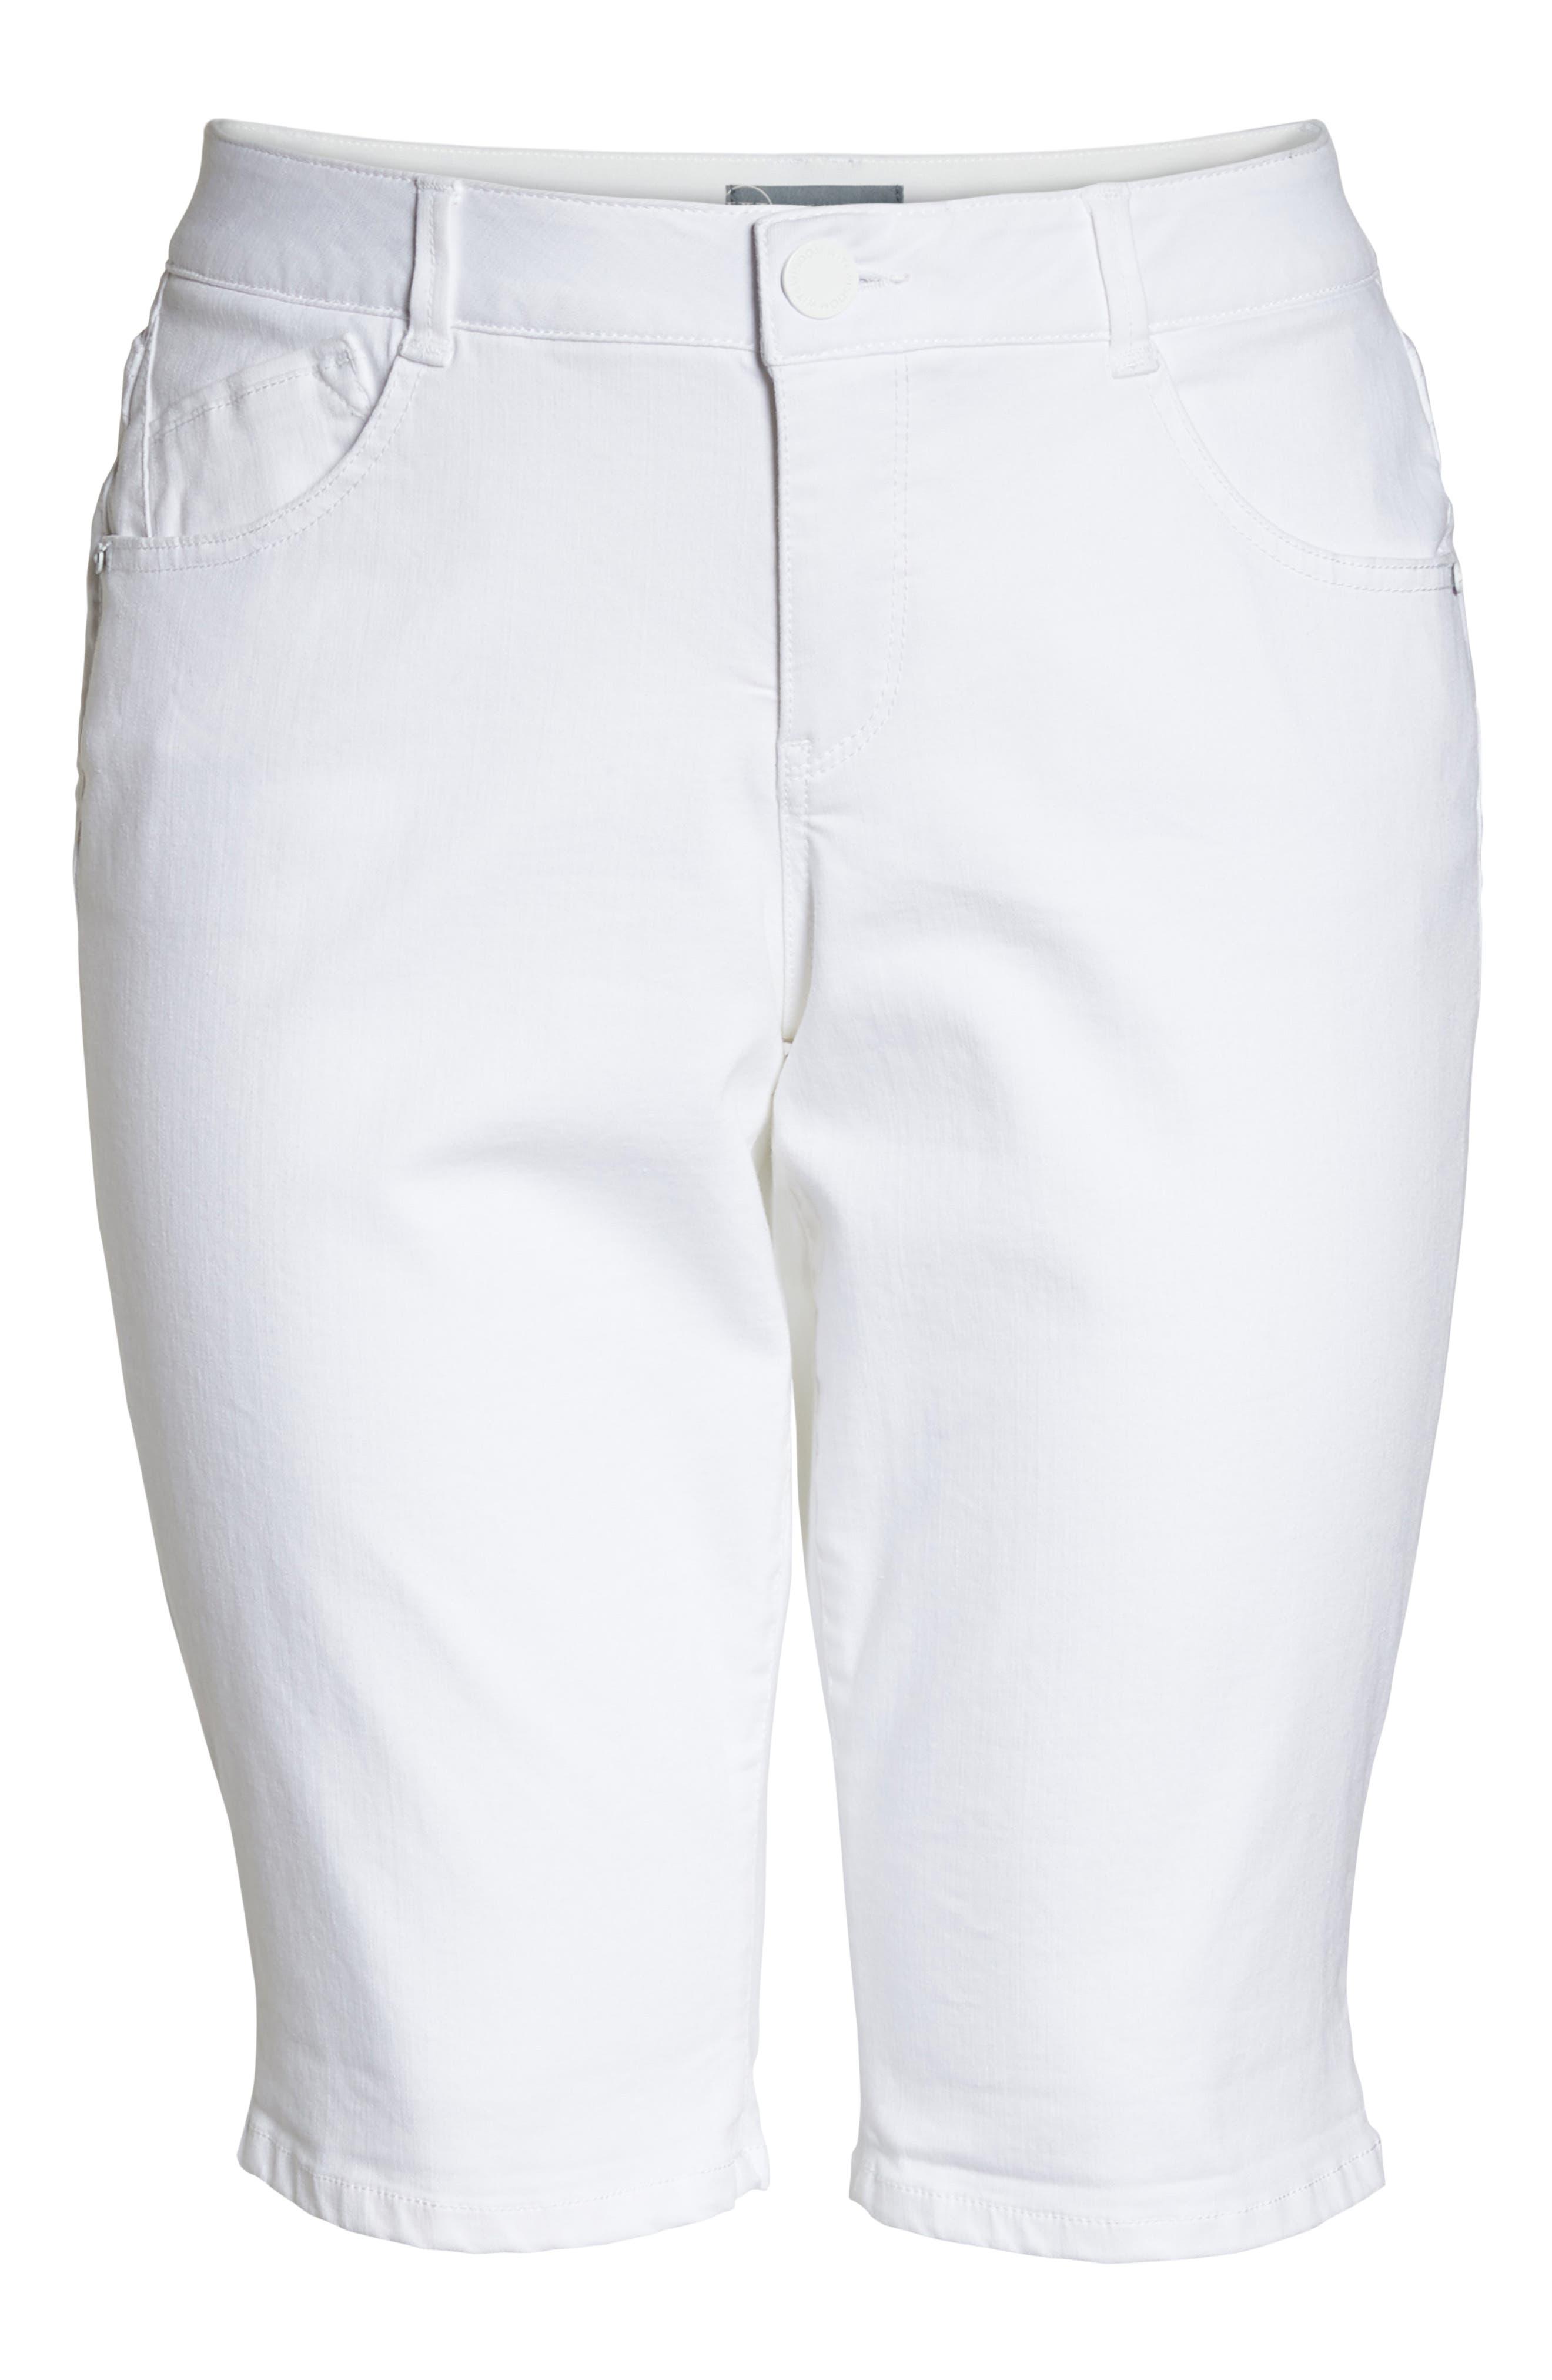 Ab-solution Bermuda Shorts,                             Alternate thumbnail 7, color,                             Optic White